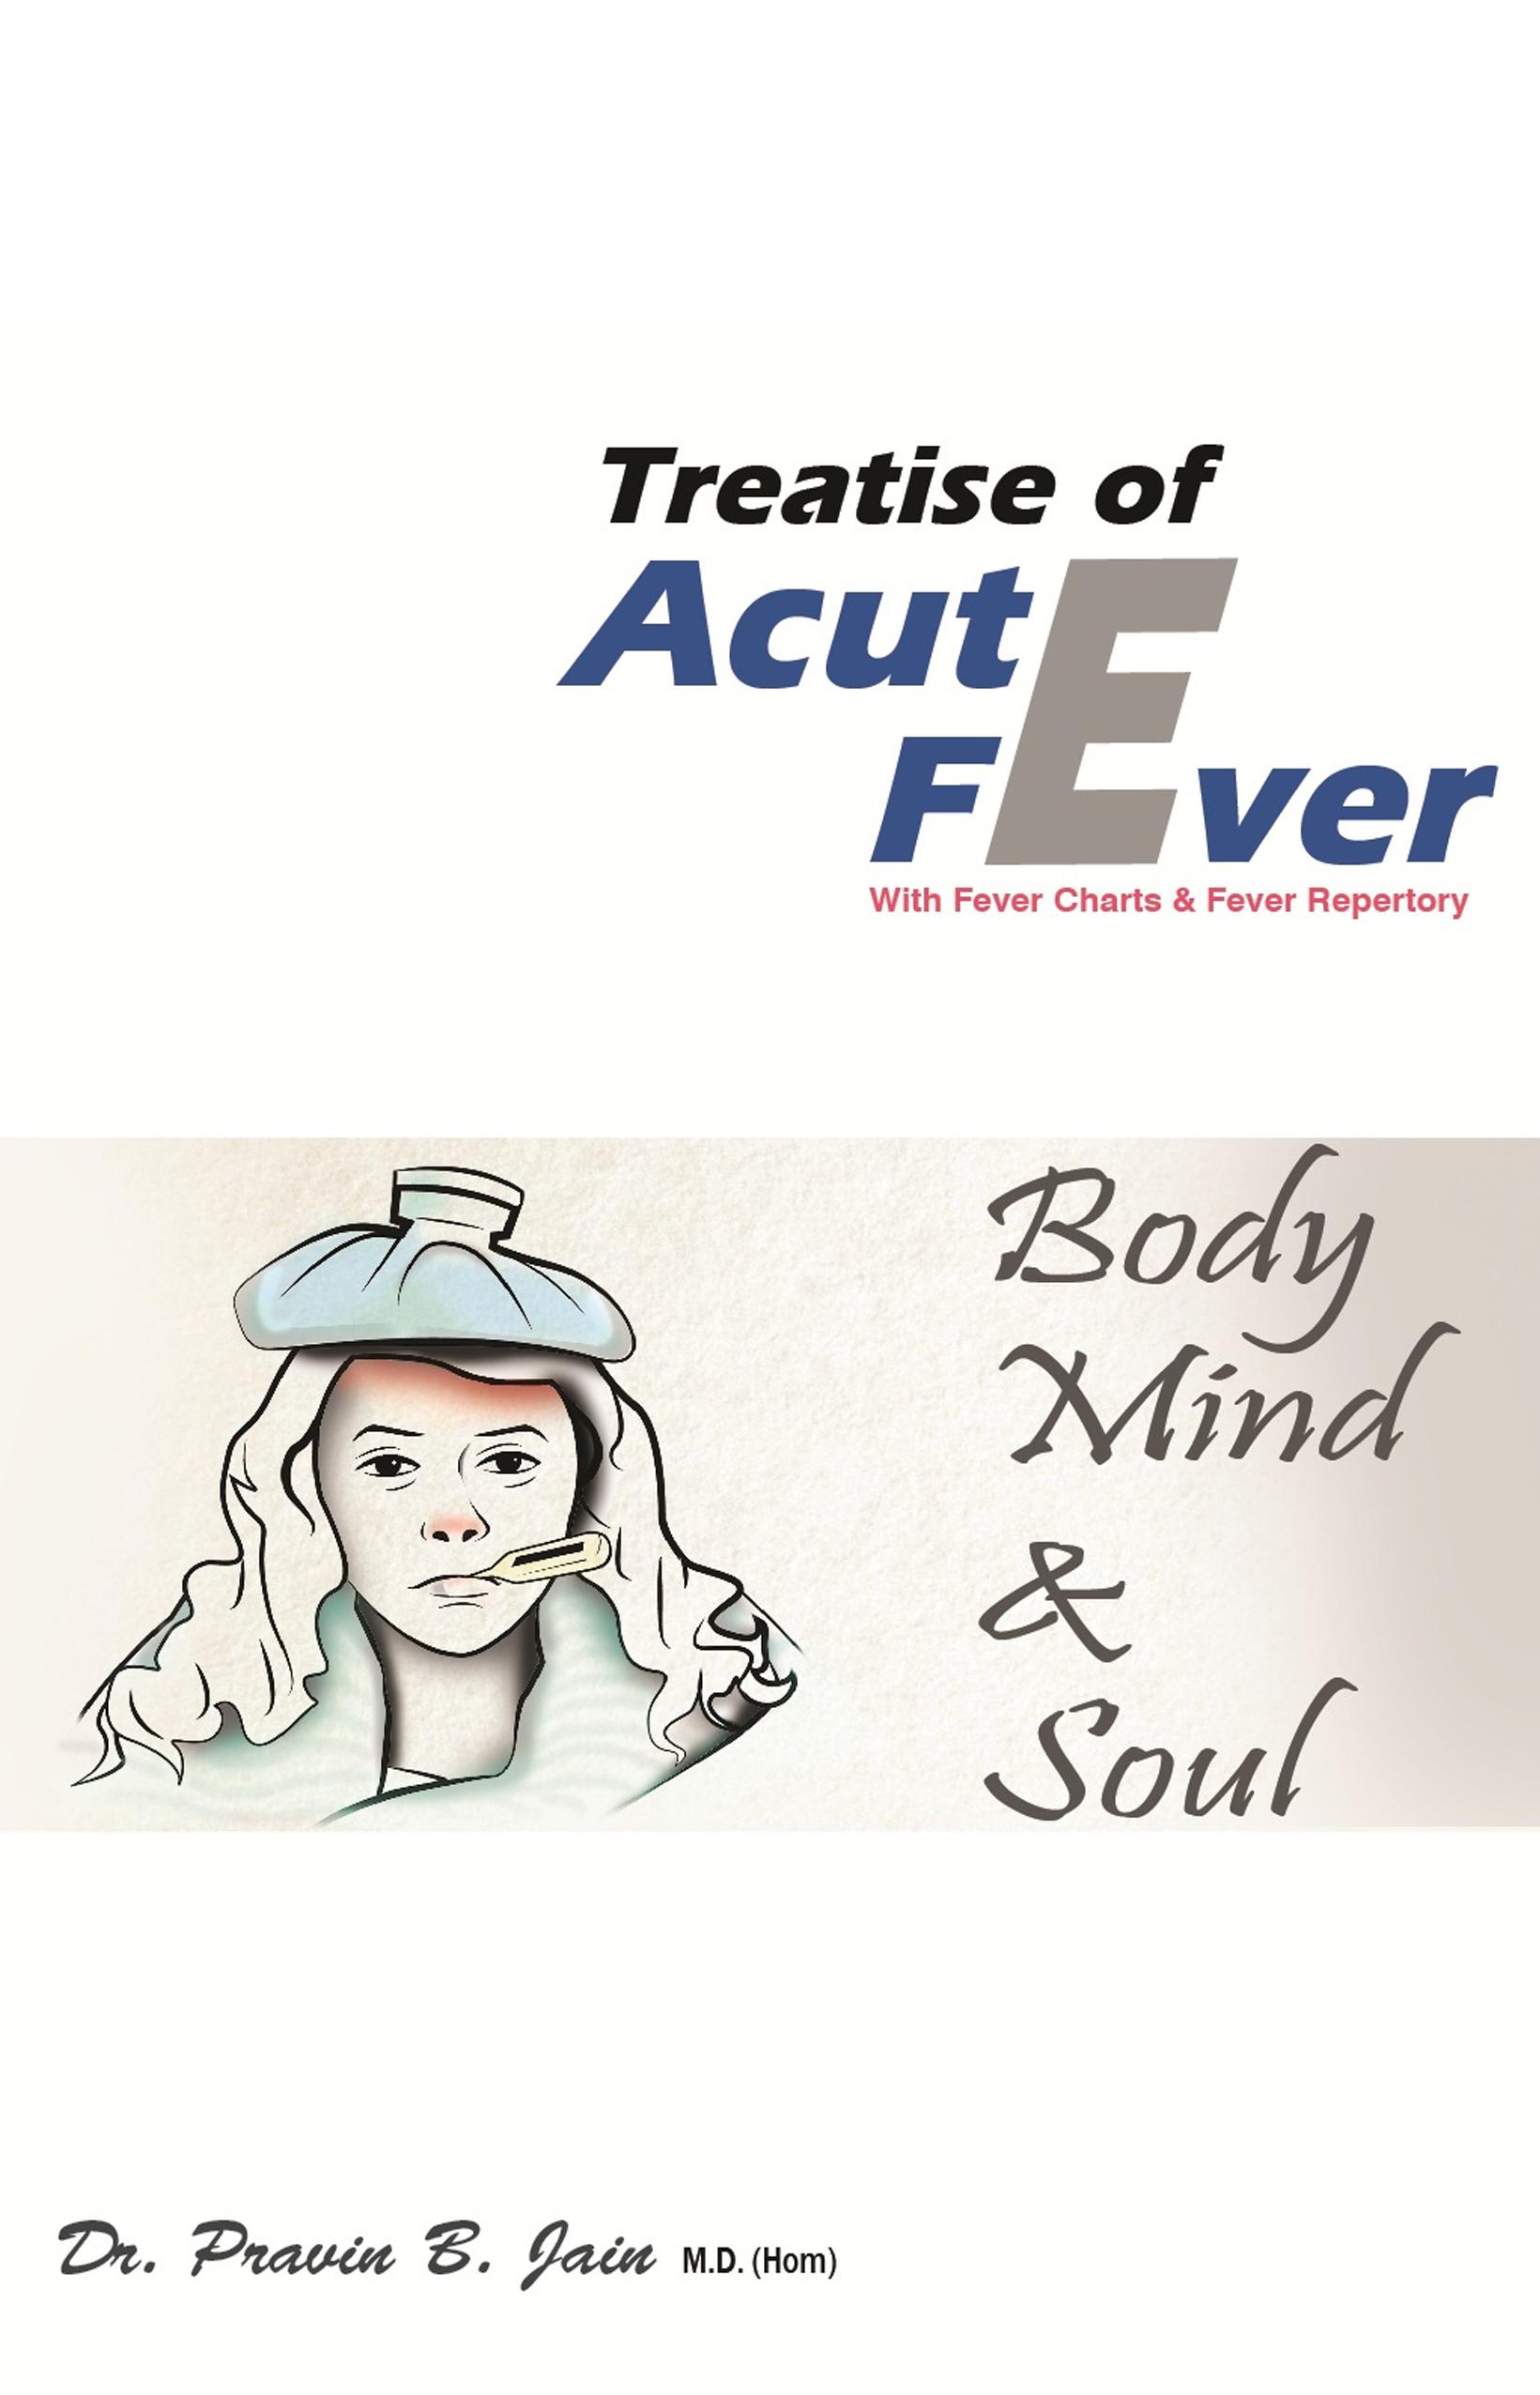 Treatise of Acutes